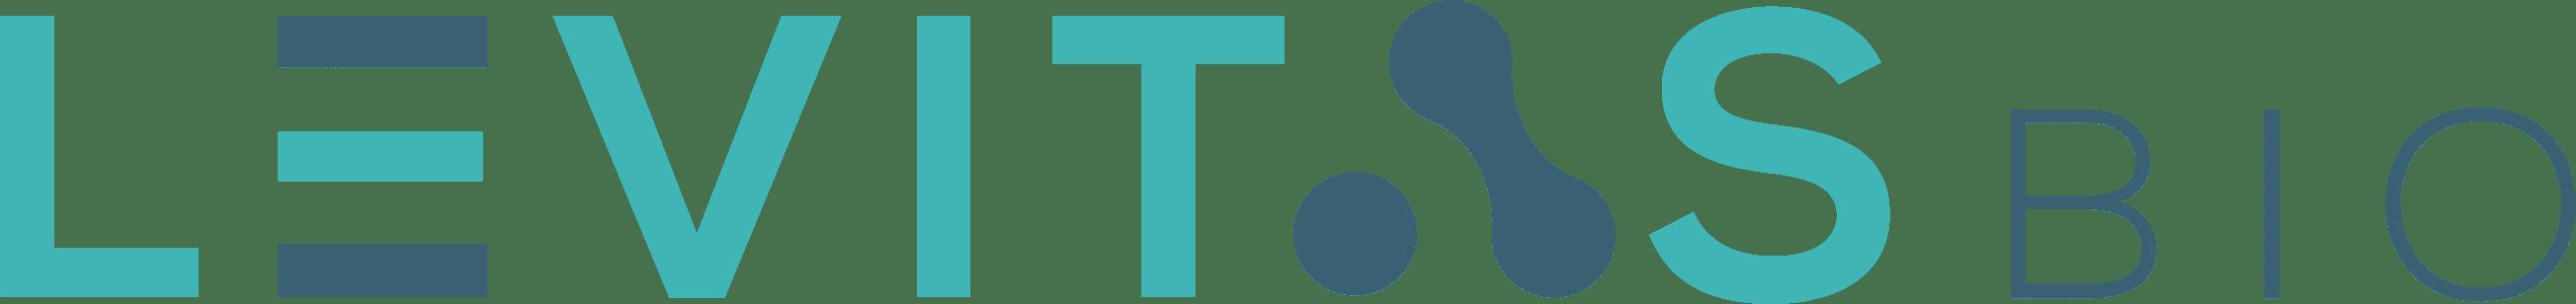 Levitas logo